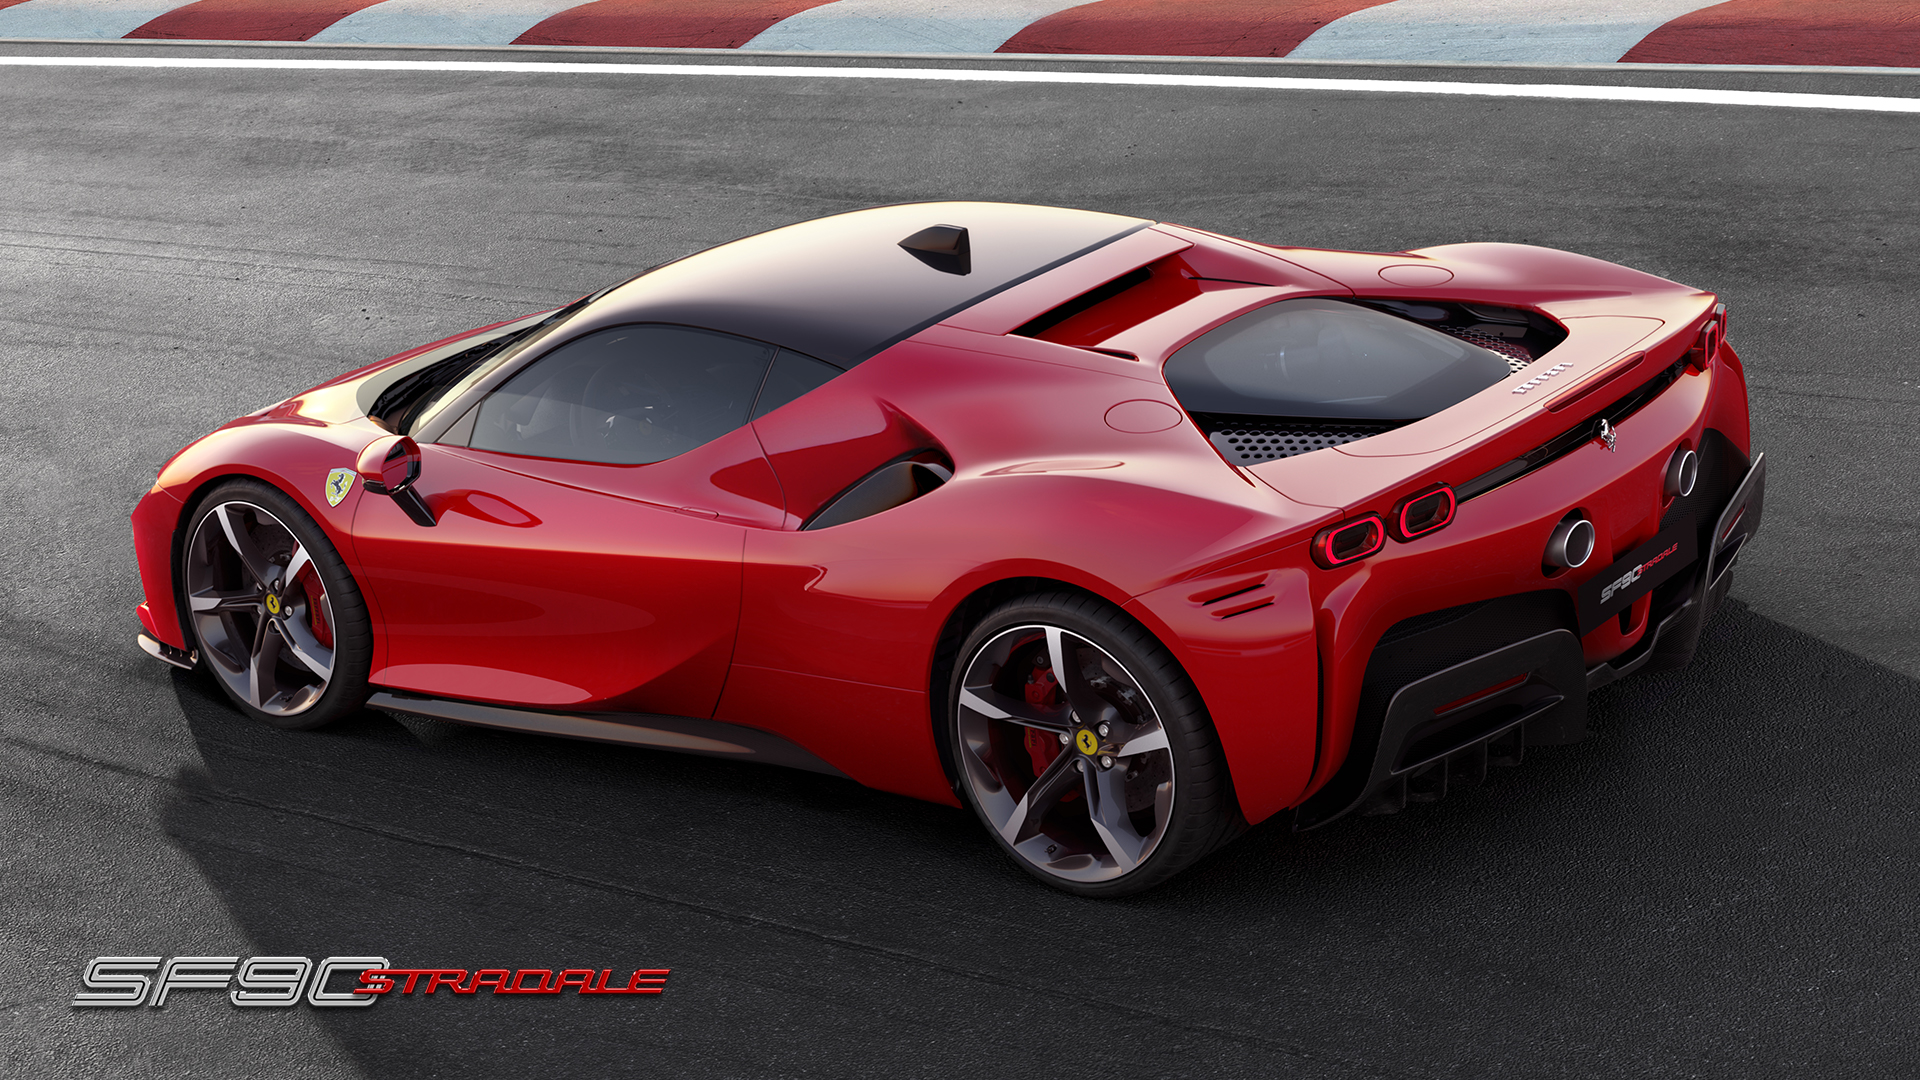 Ferrari SF90 Stradale rear 3/4